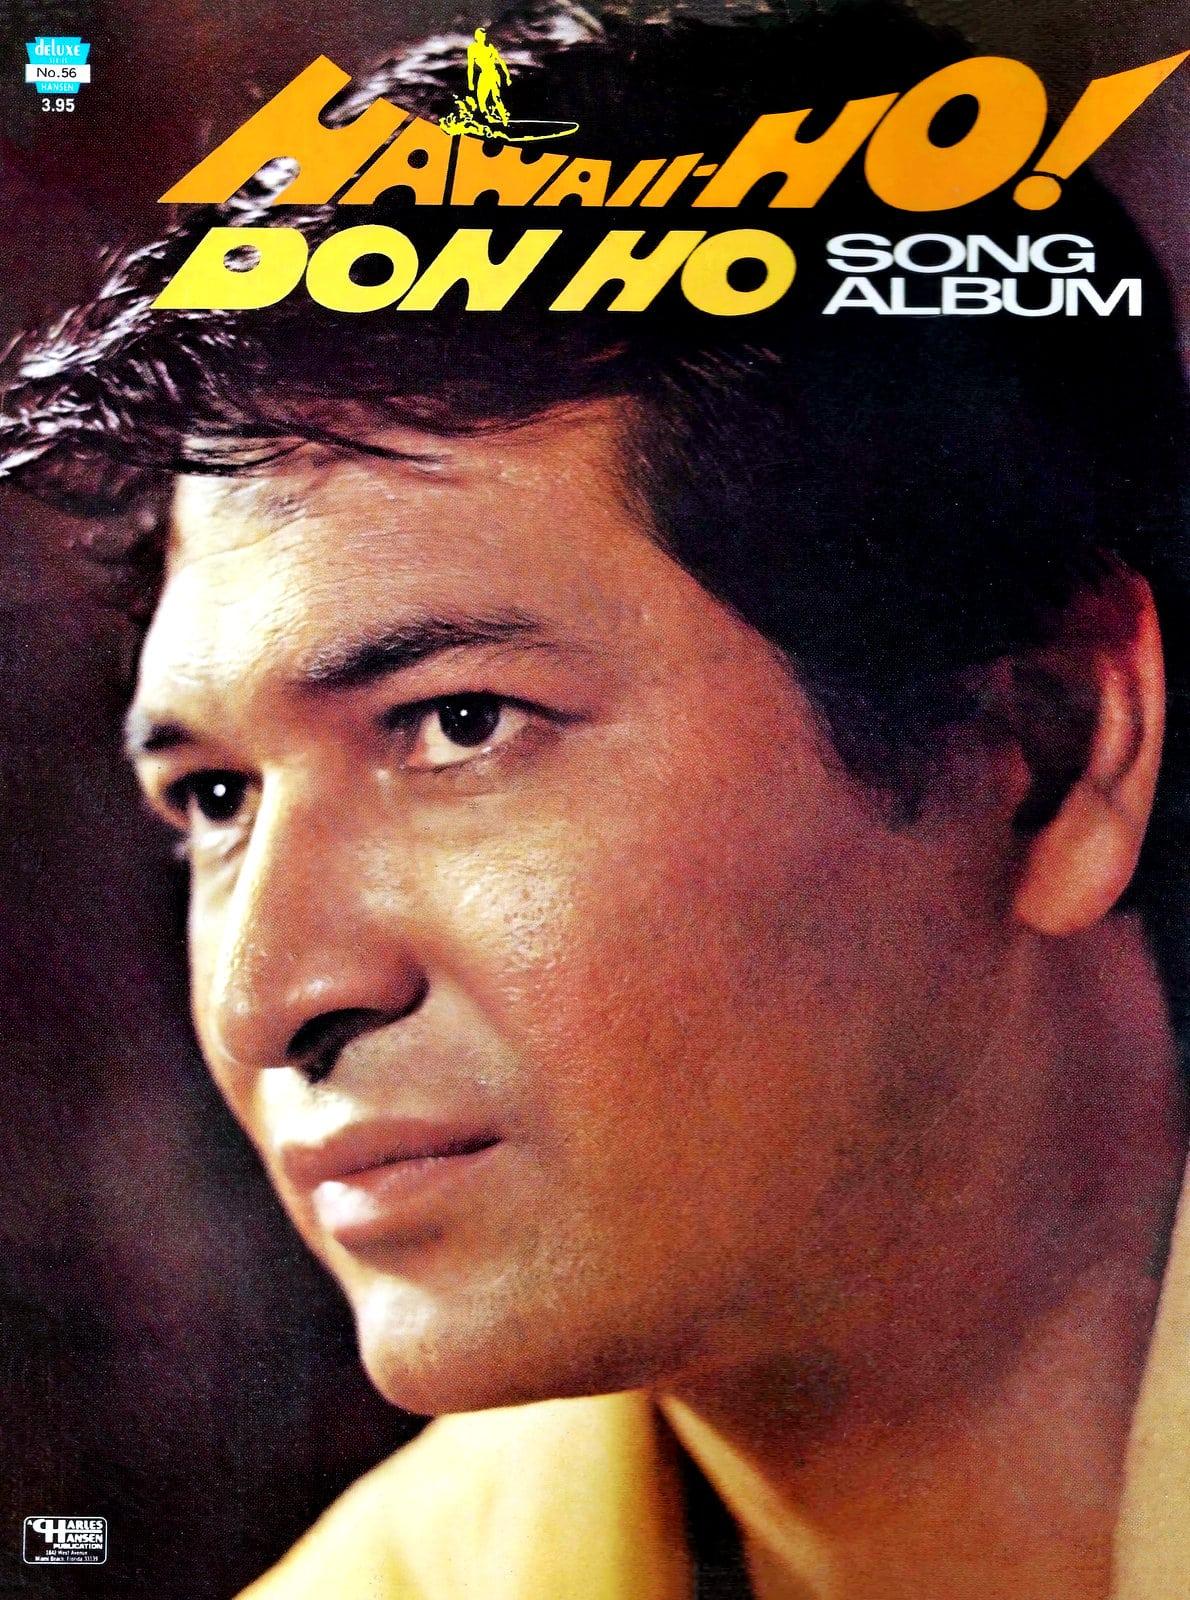 Don Ho - Vintage Hawaii Ho song album